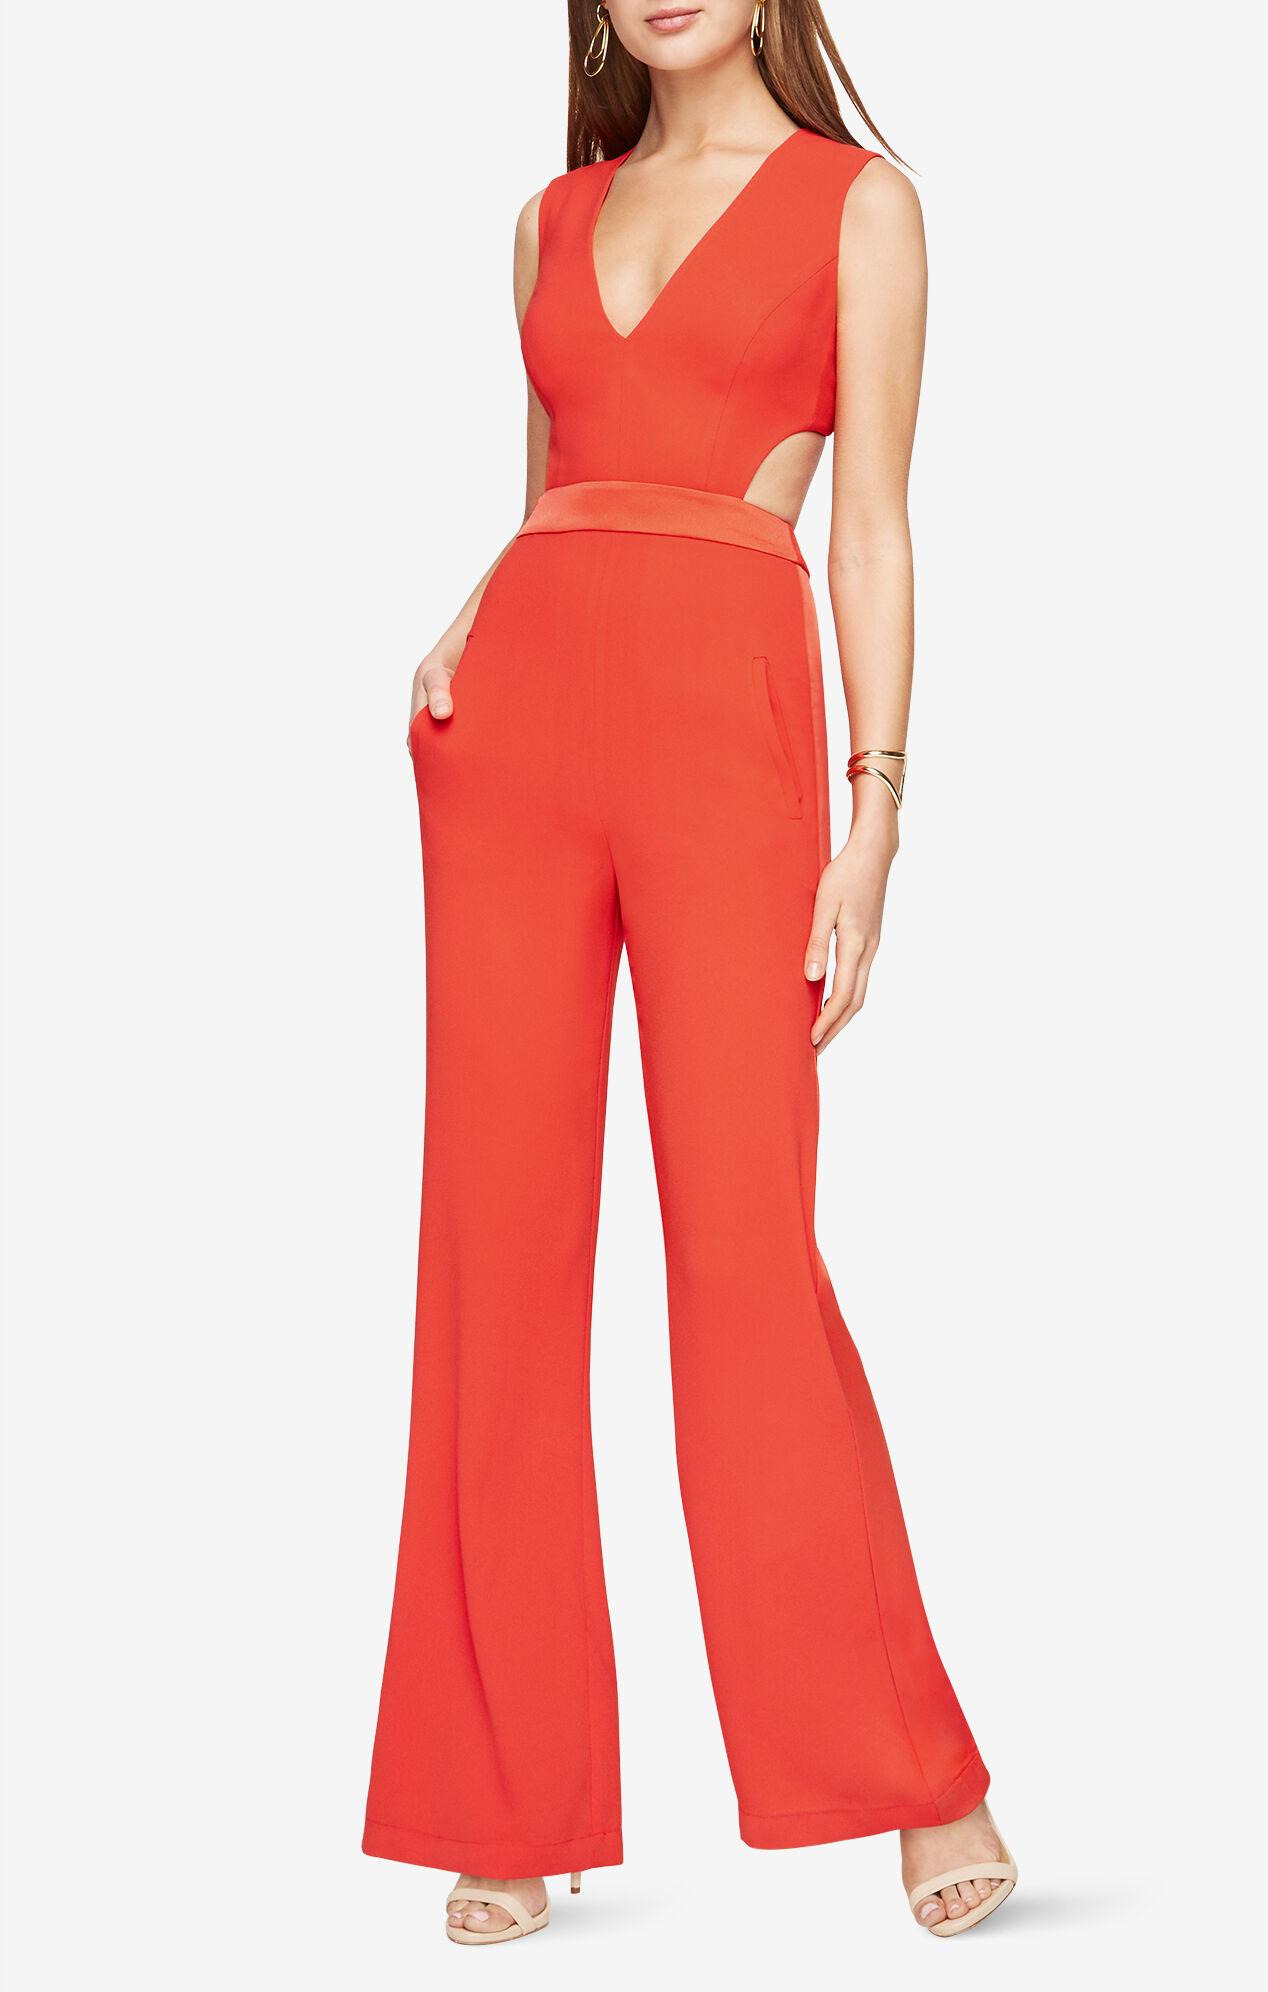 Excellent  Orange Convict Costume Sale  Men Or Women Orange Prison Jumpsuits